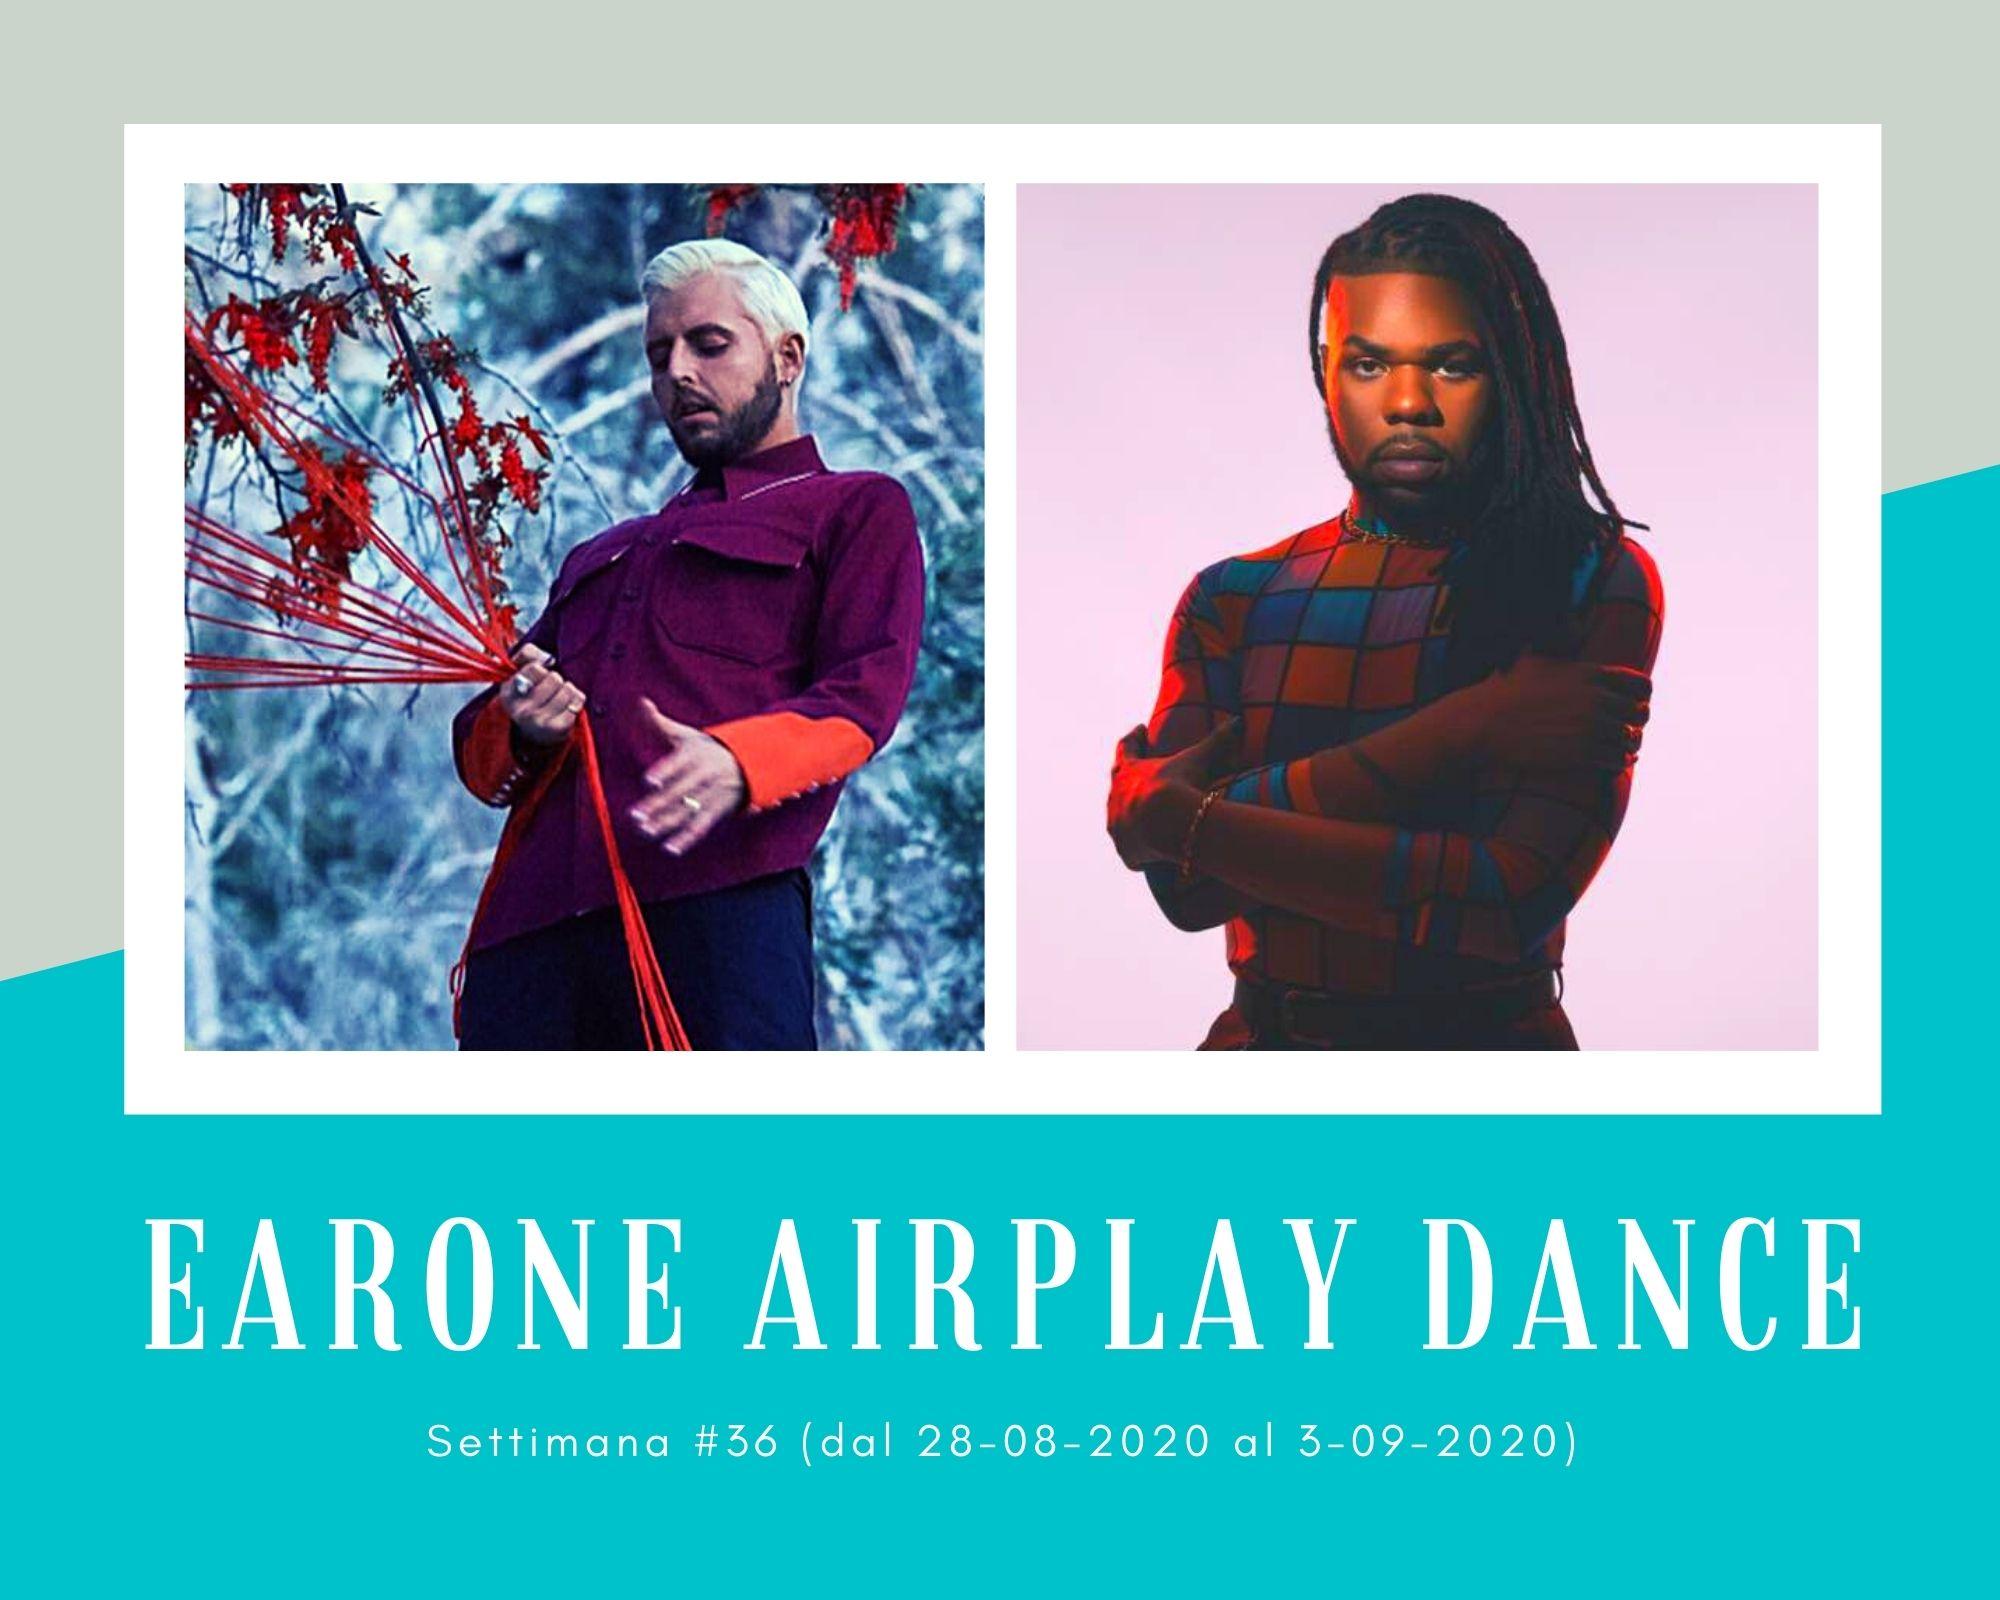 Classifica Radio EarOne Airplay Dance, week 36: Avanzano le accoppiate Lgbt Joel Corry & Mnek e Kungs & JHart. In vetta Topic & A7s